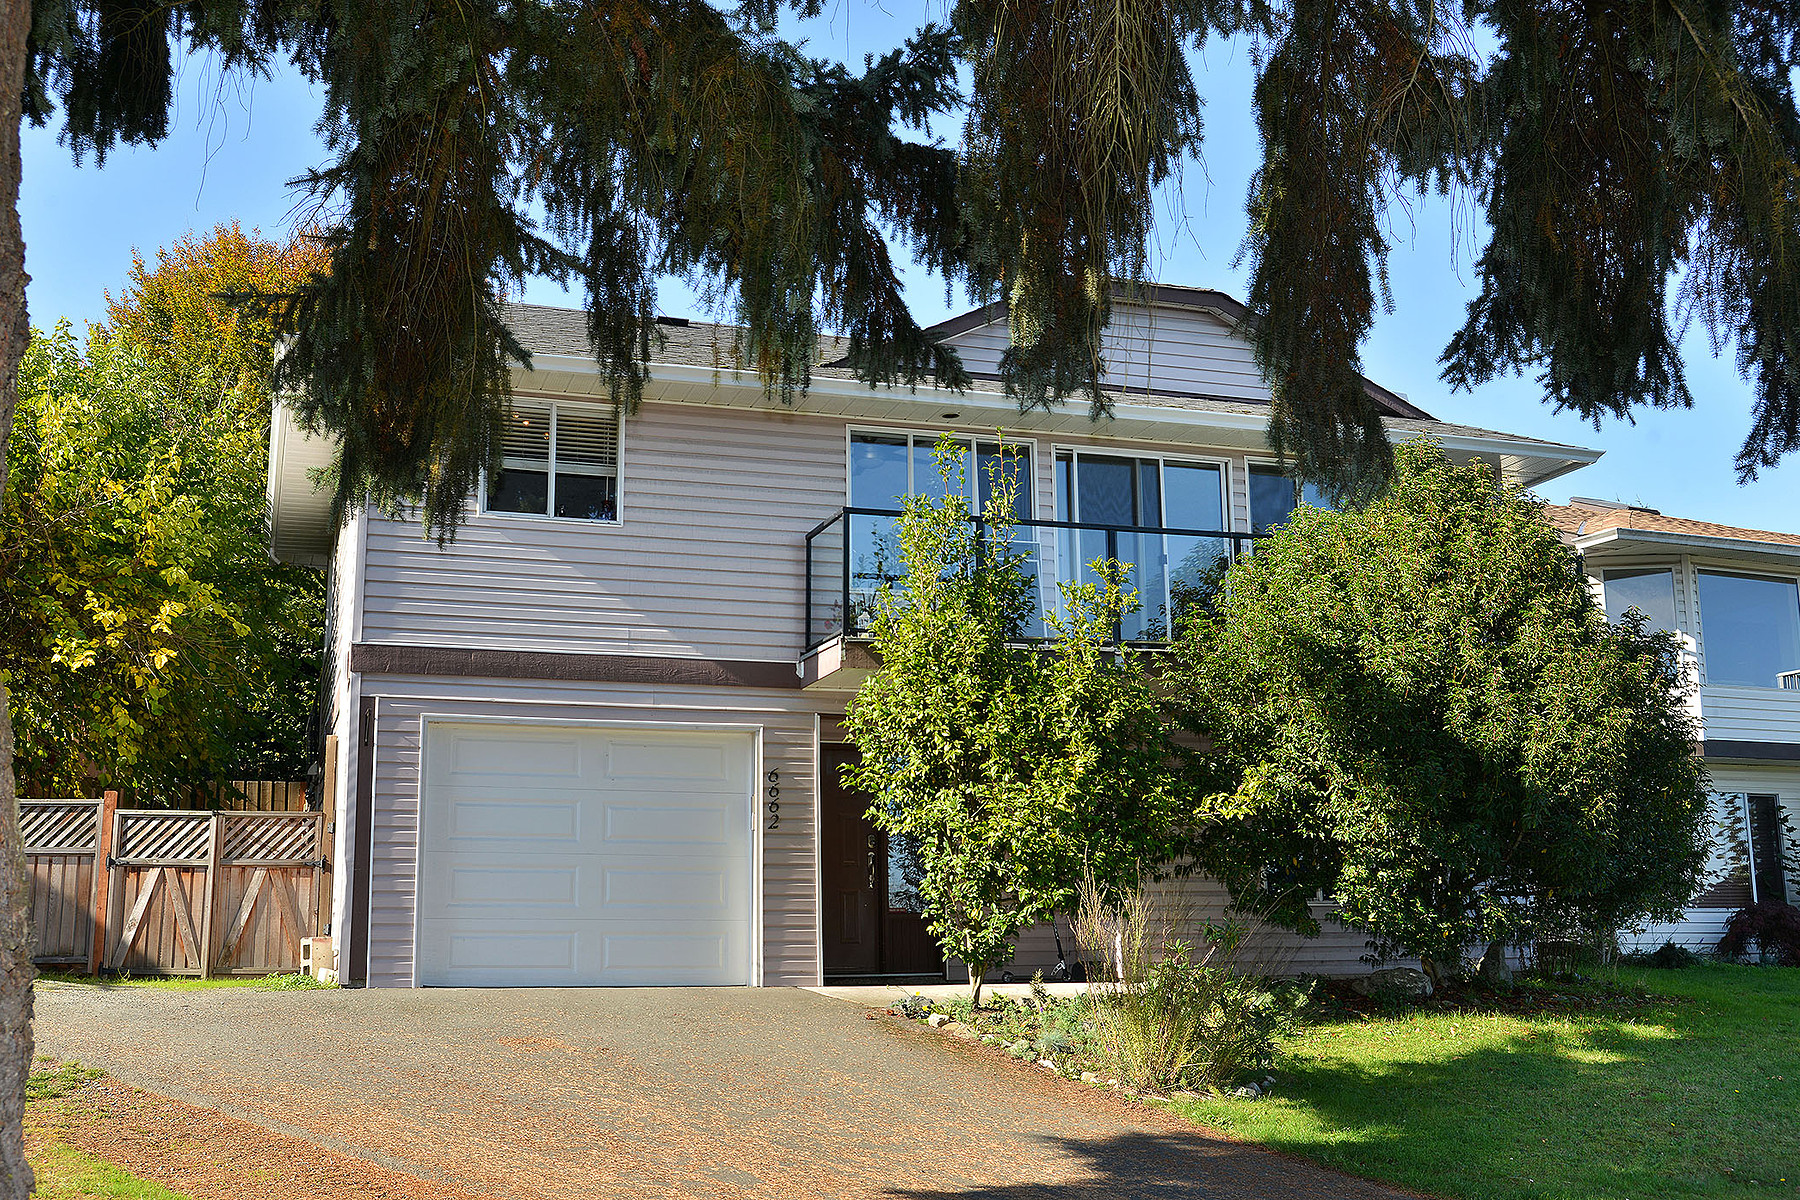 Tek Ailelik Ev için Satış at Mortgage Helper 6662 Rey Road Victoria, British Columbia V8Y 1V2 Kanada